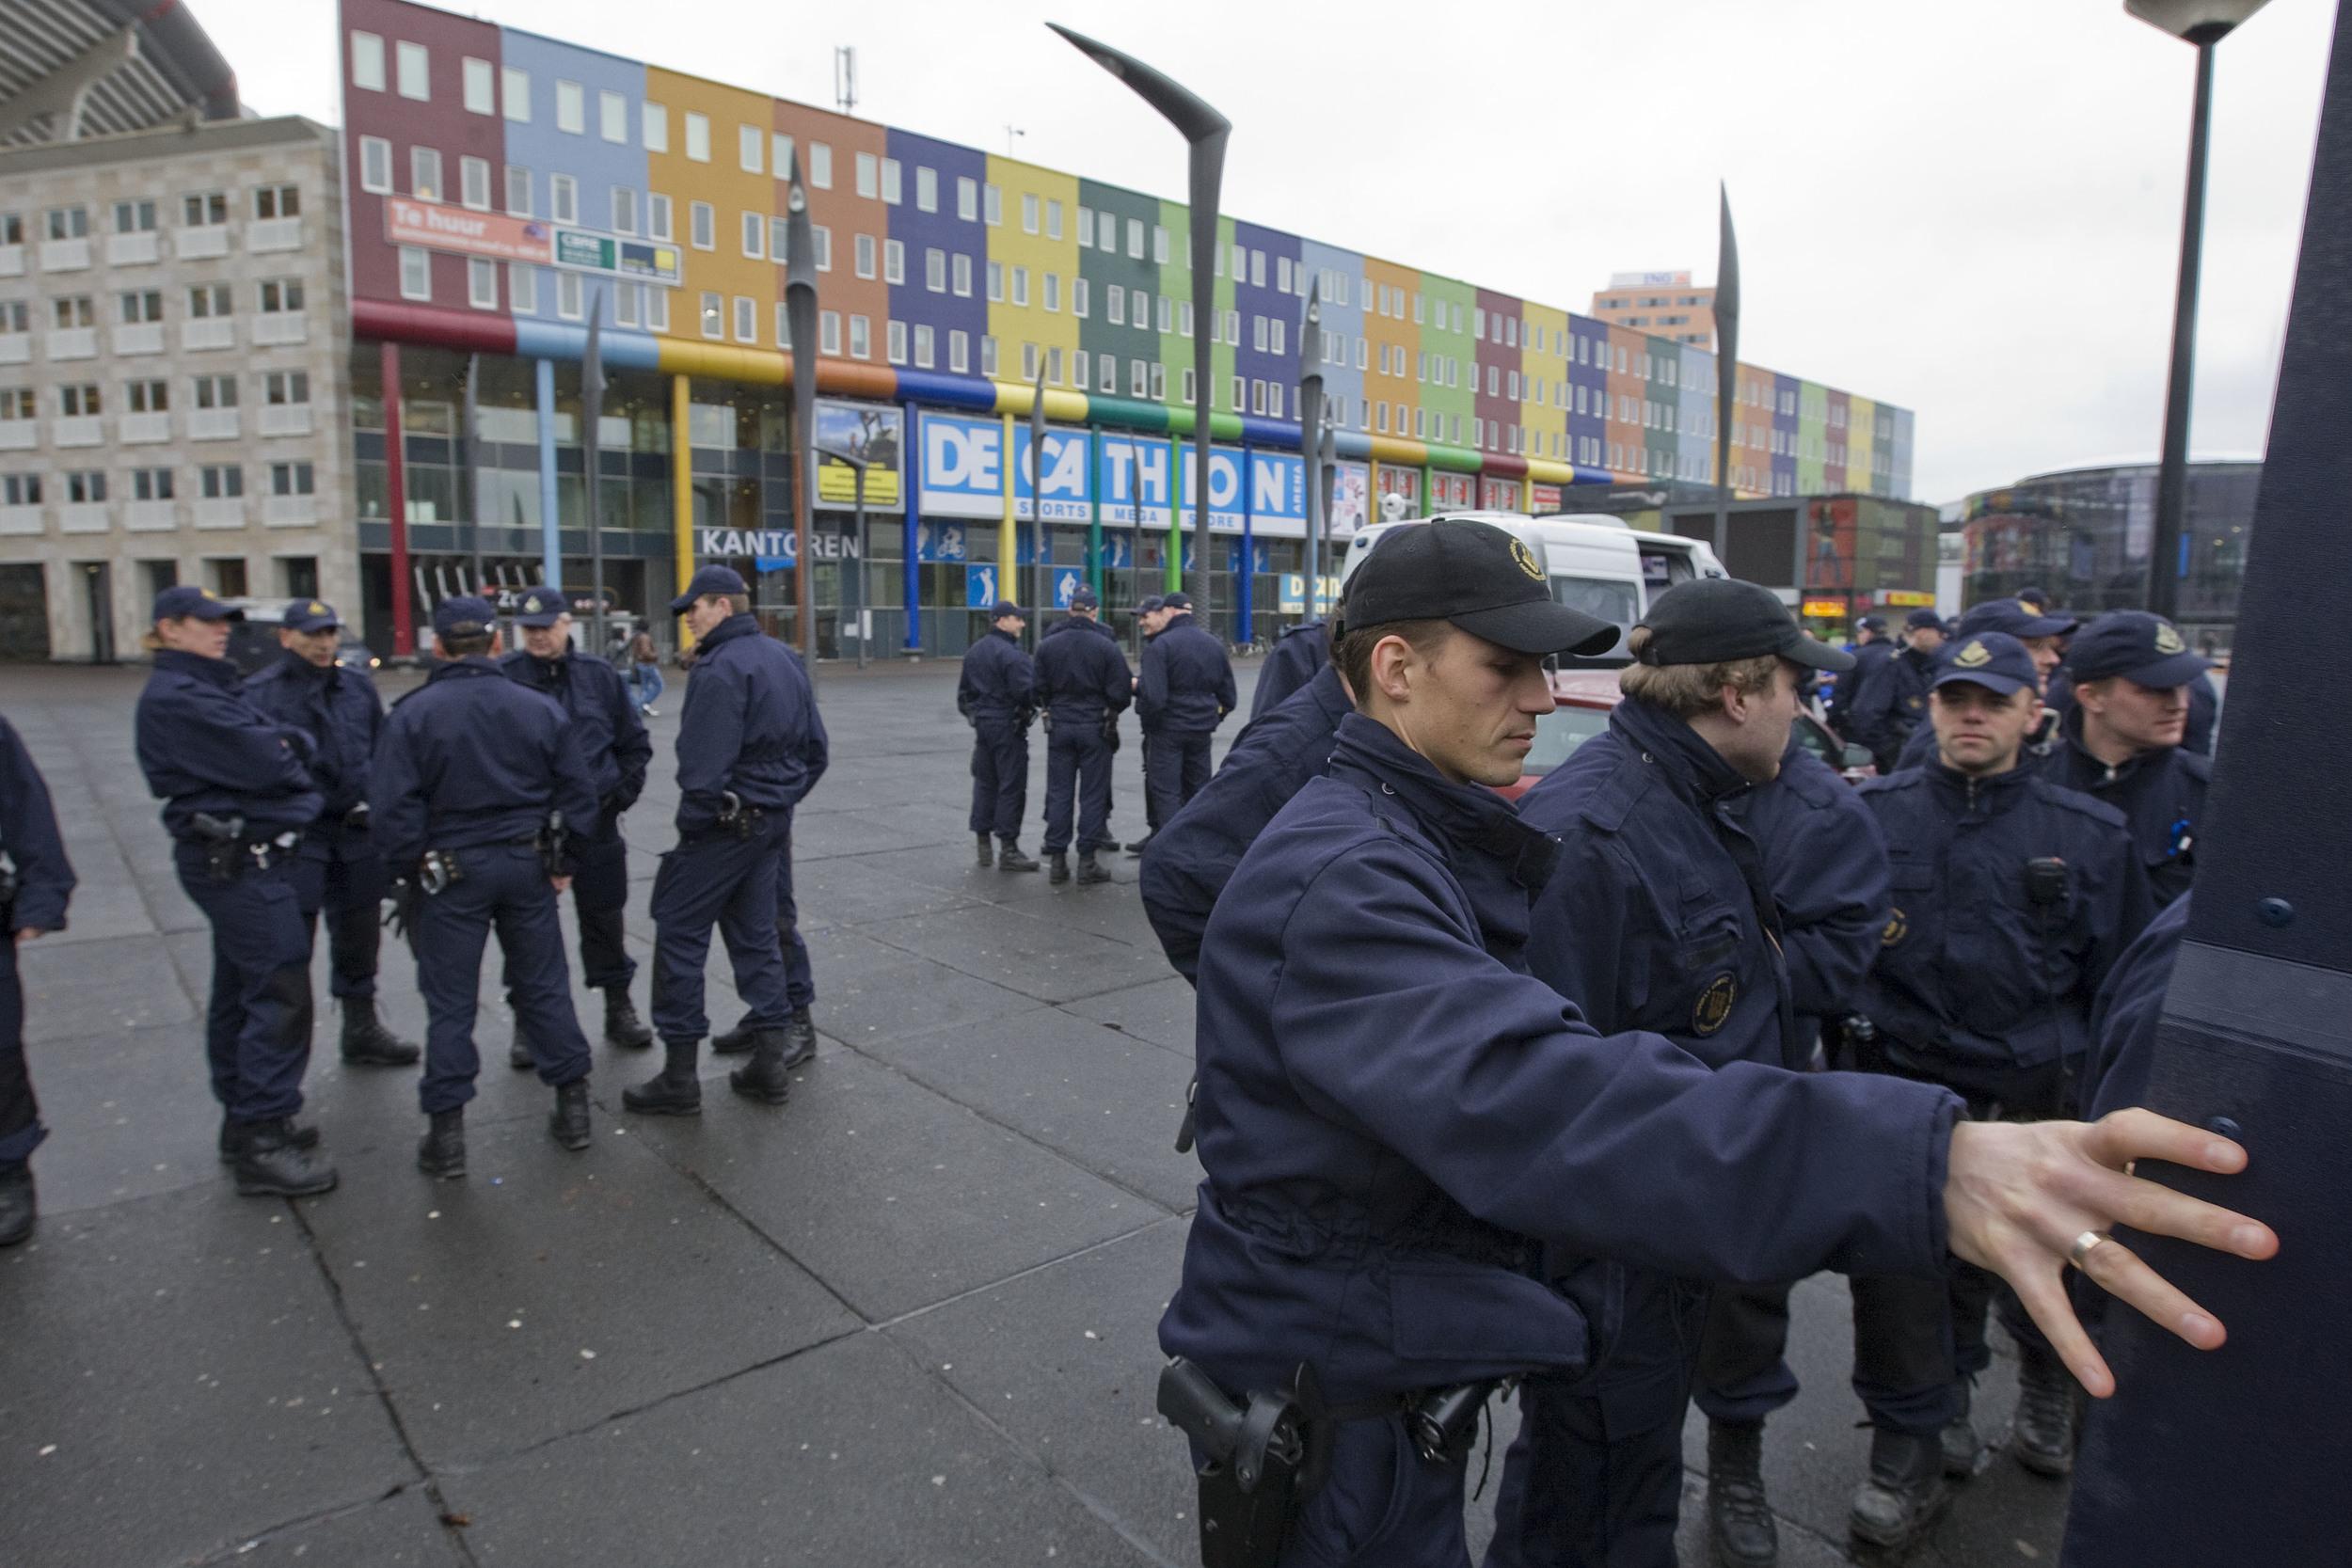 Police blockade in Amsterdam's Bijlmer Community